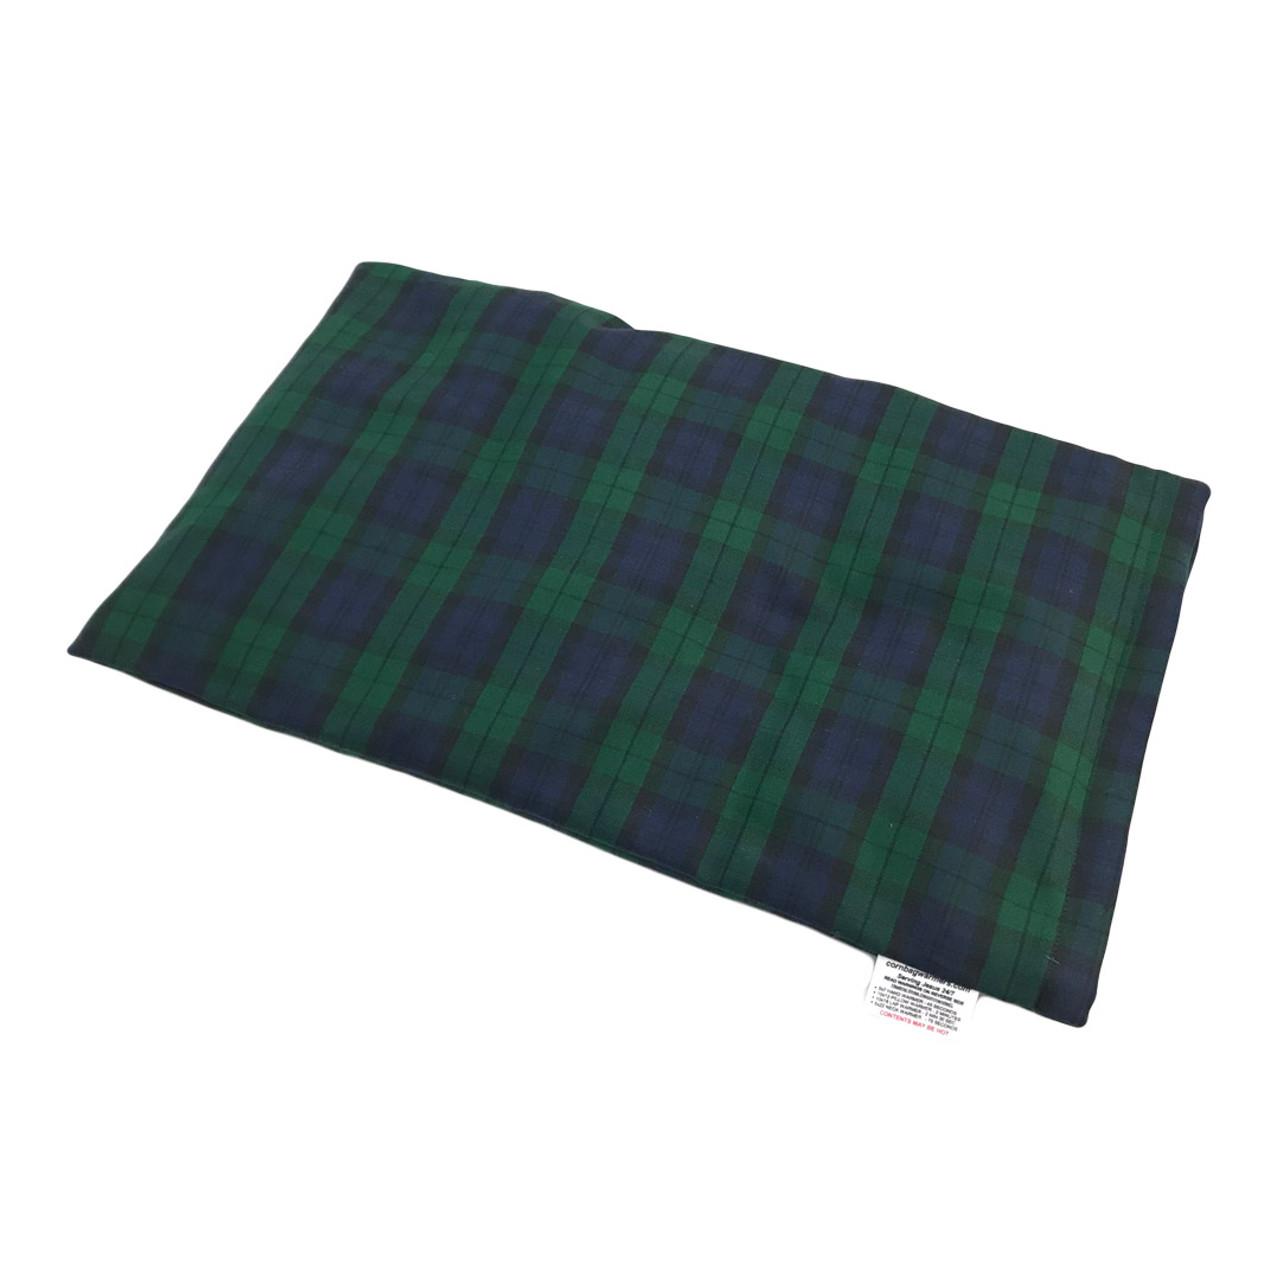 Deep Blue and Green Plaid Neck Warmer Microwaveable Corn Heating Pad